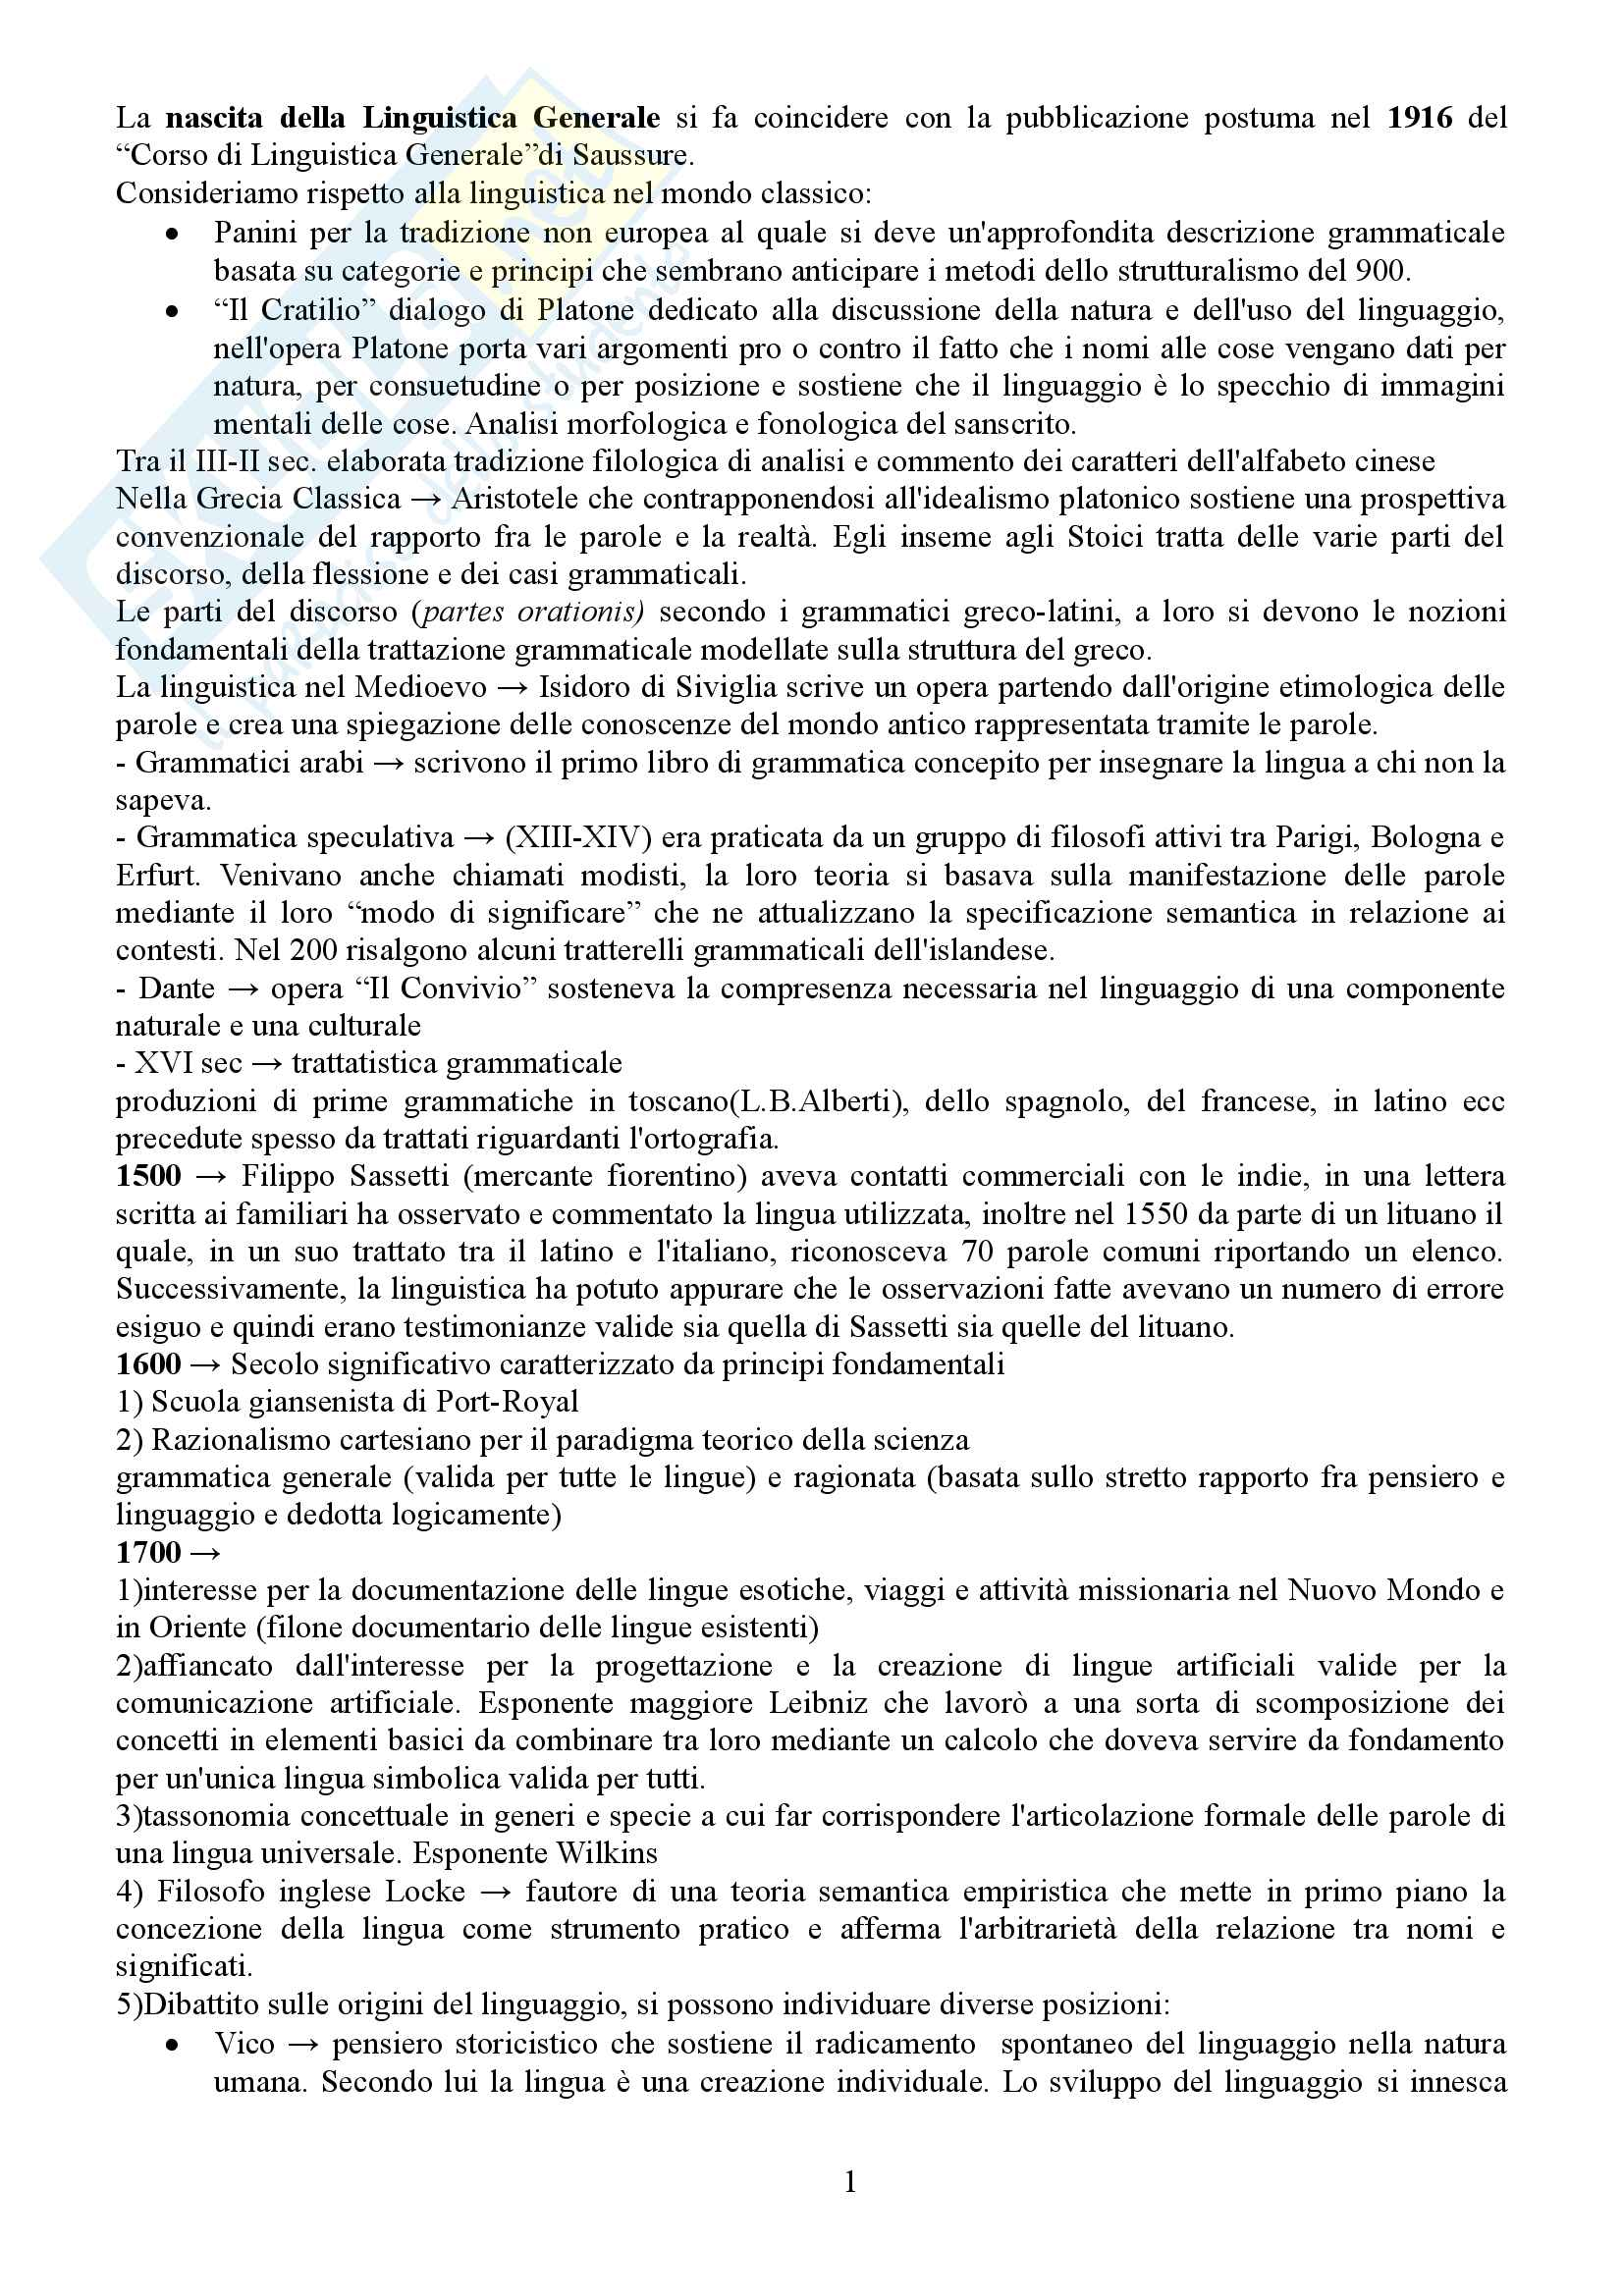 Riassunto esame Di linguistica Generale - P. Dini